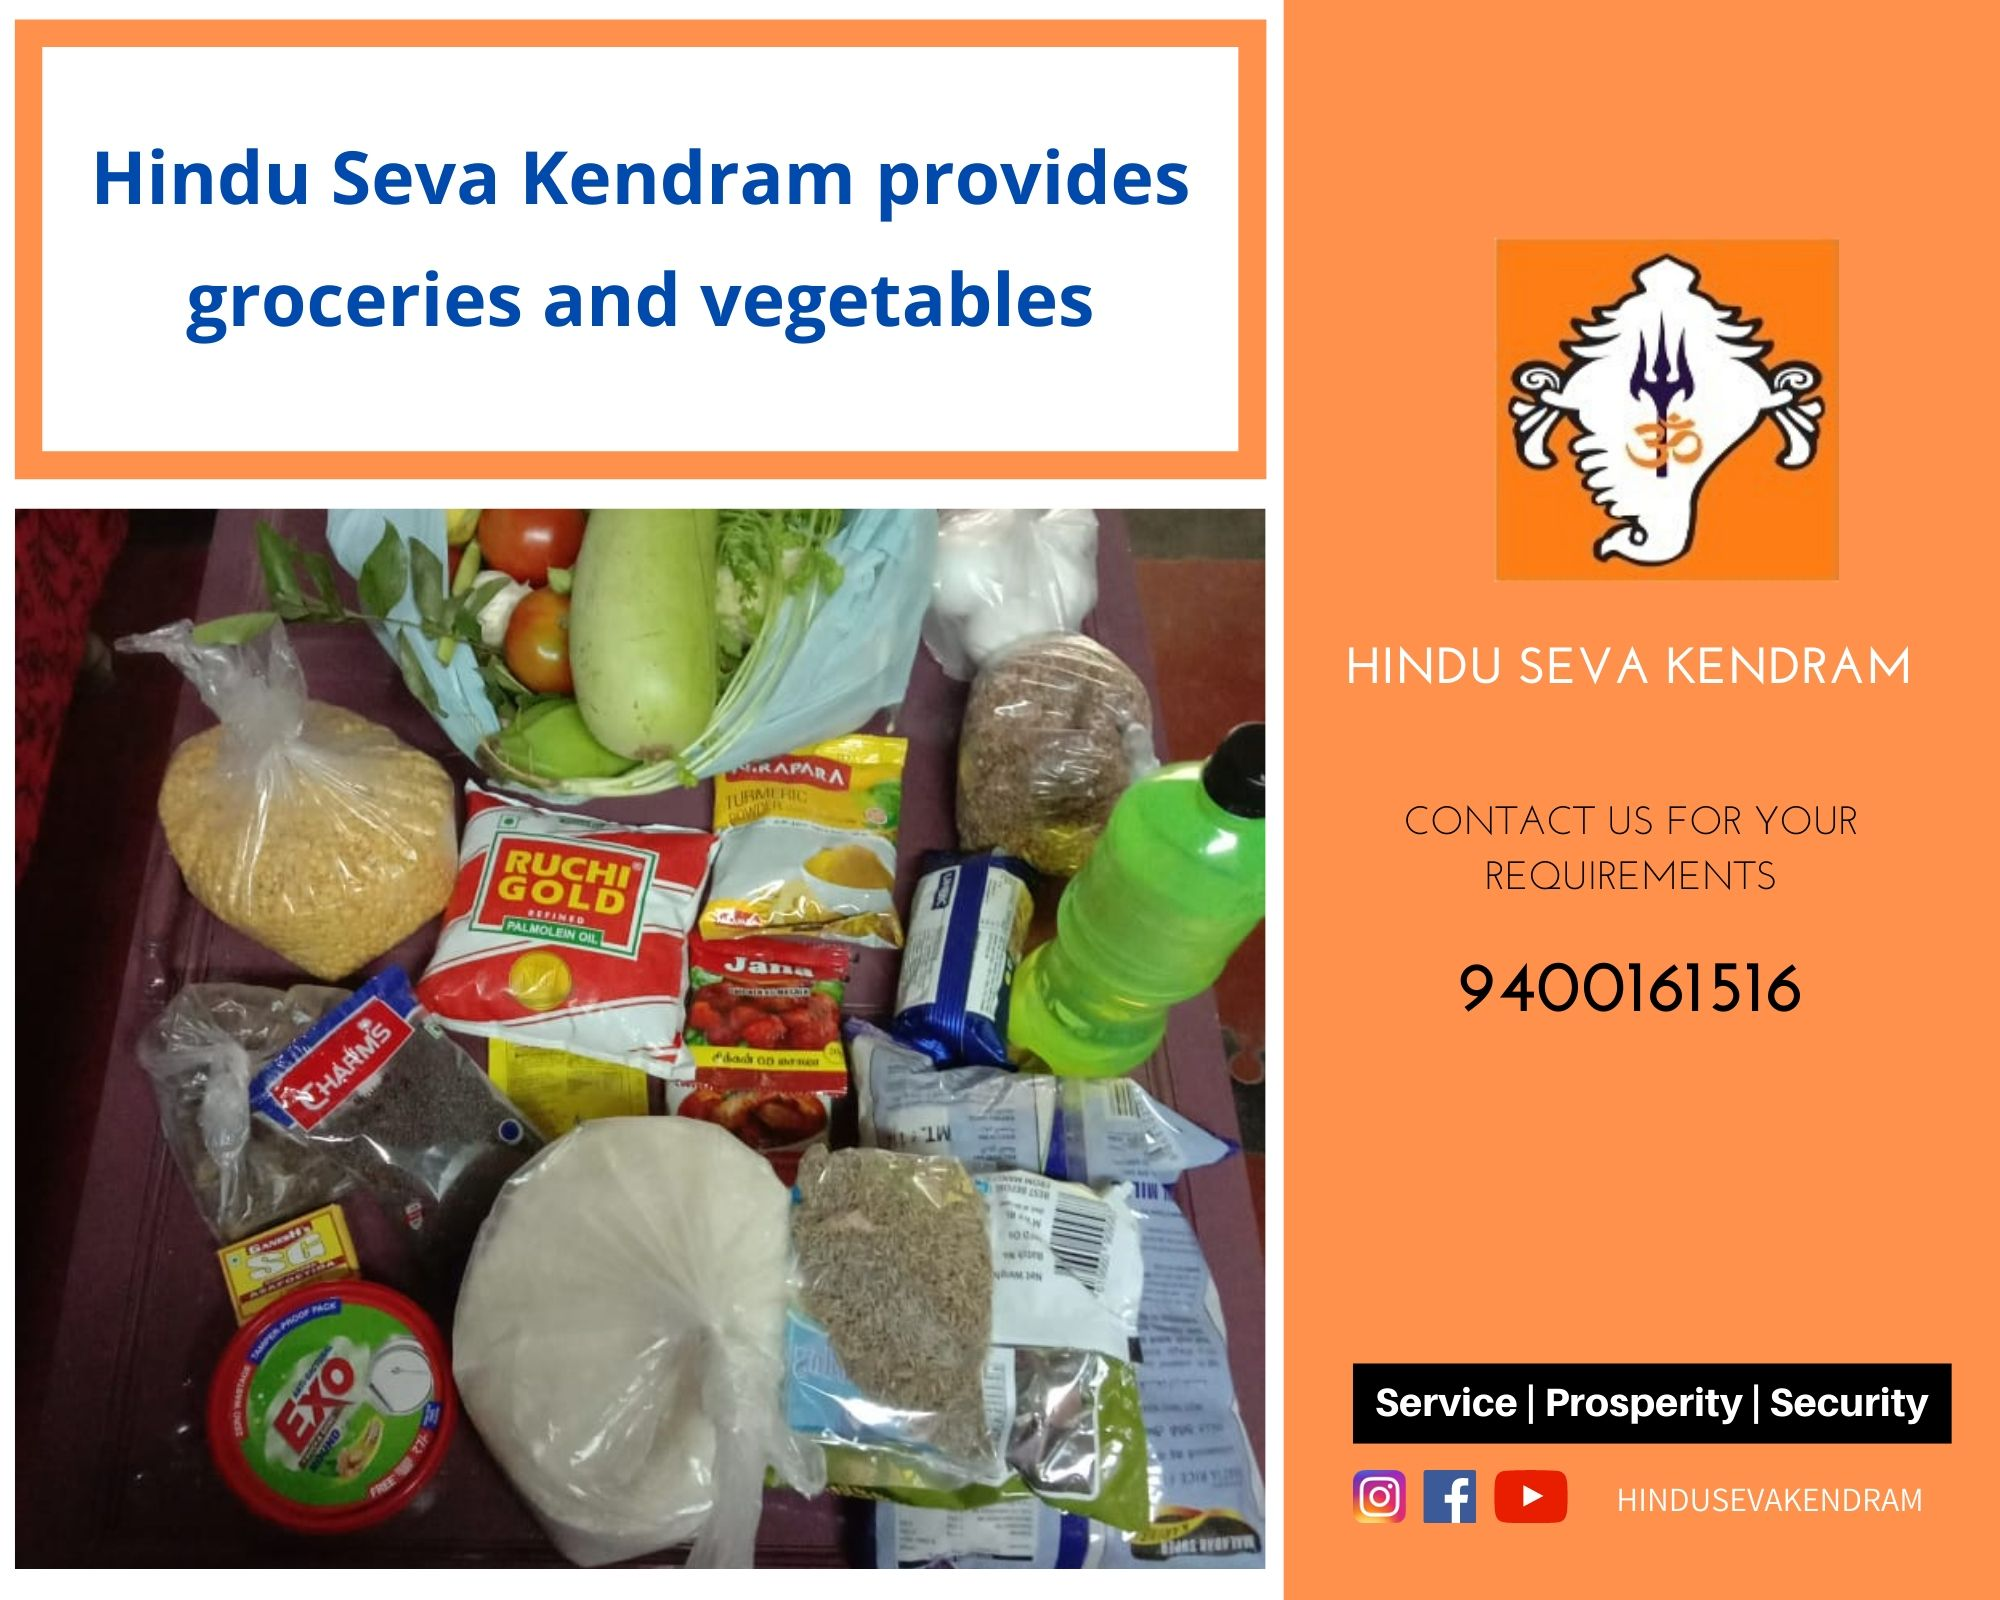 Hindu Seva Kendram provides groceries and vegetables